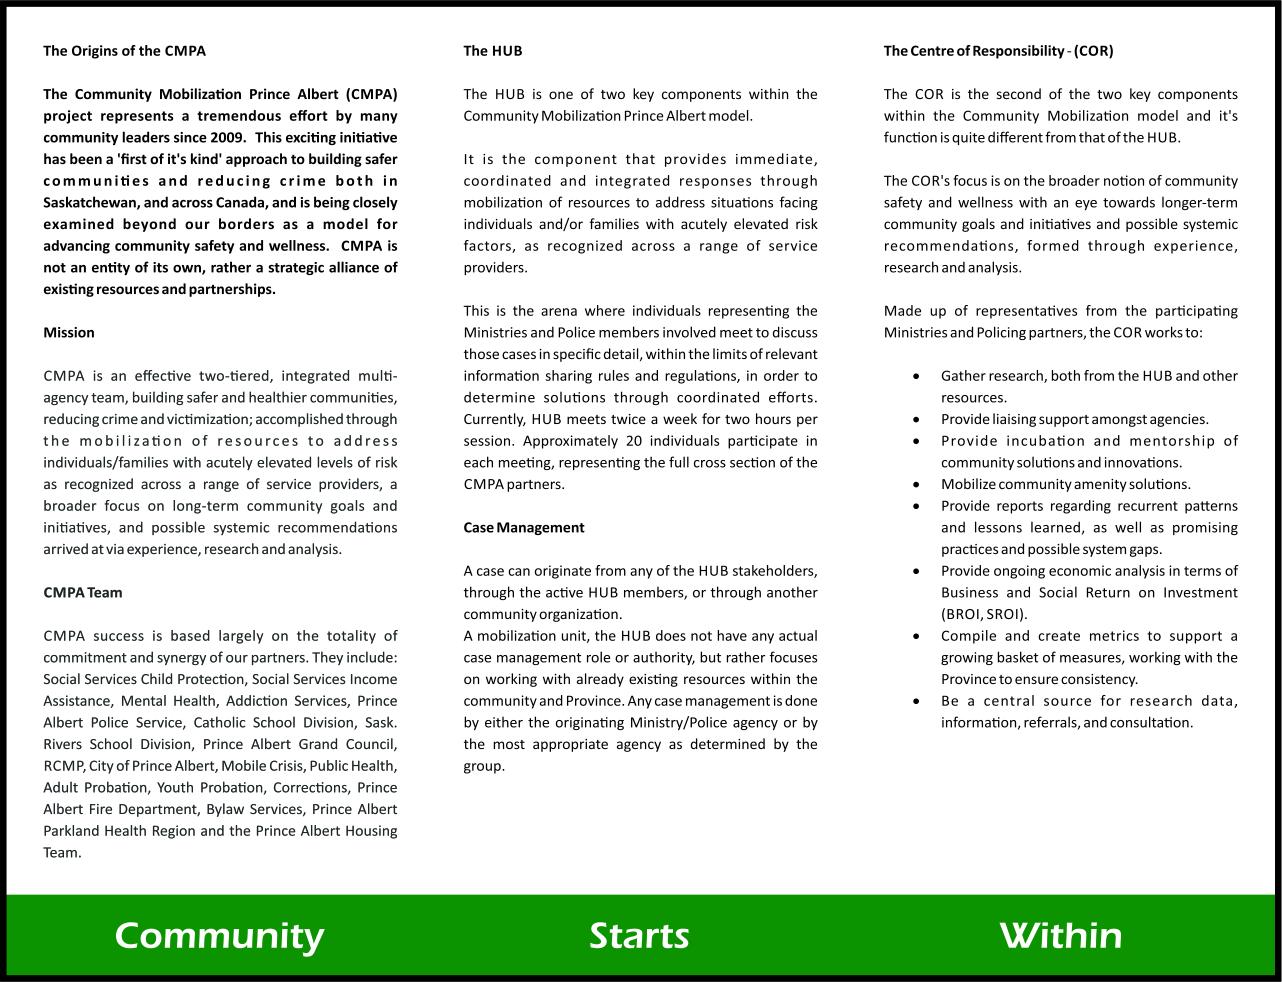 Community Mobilization - Back